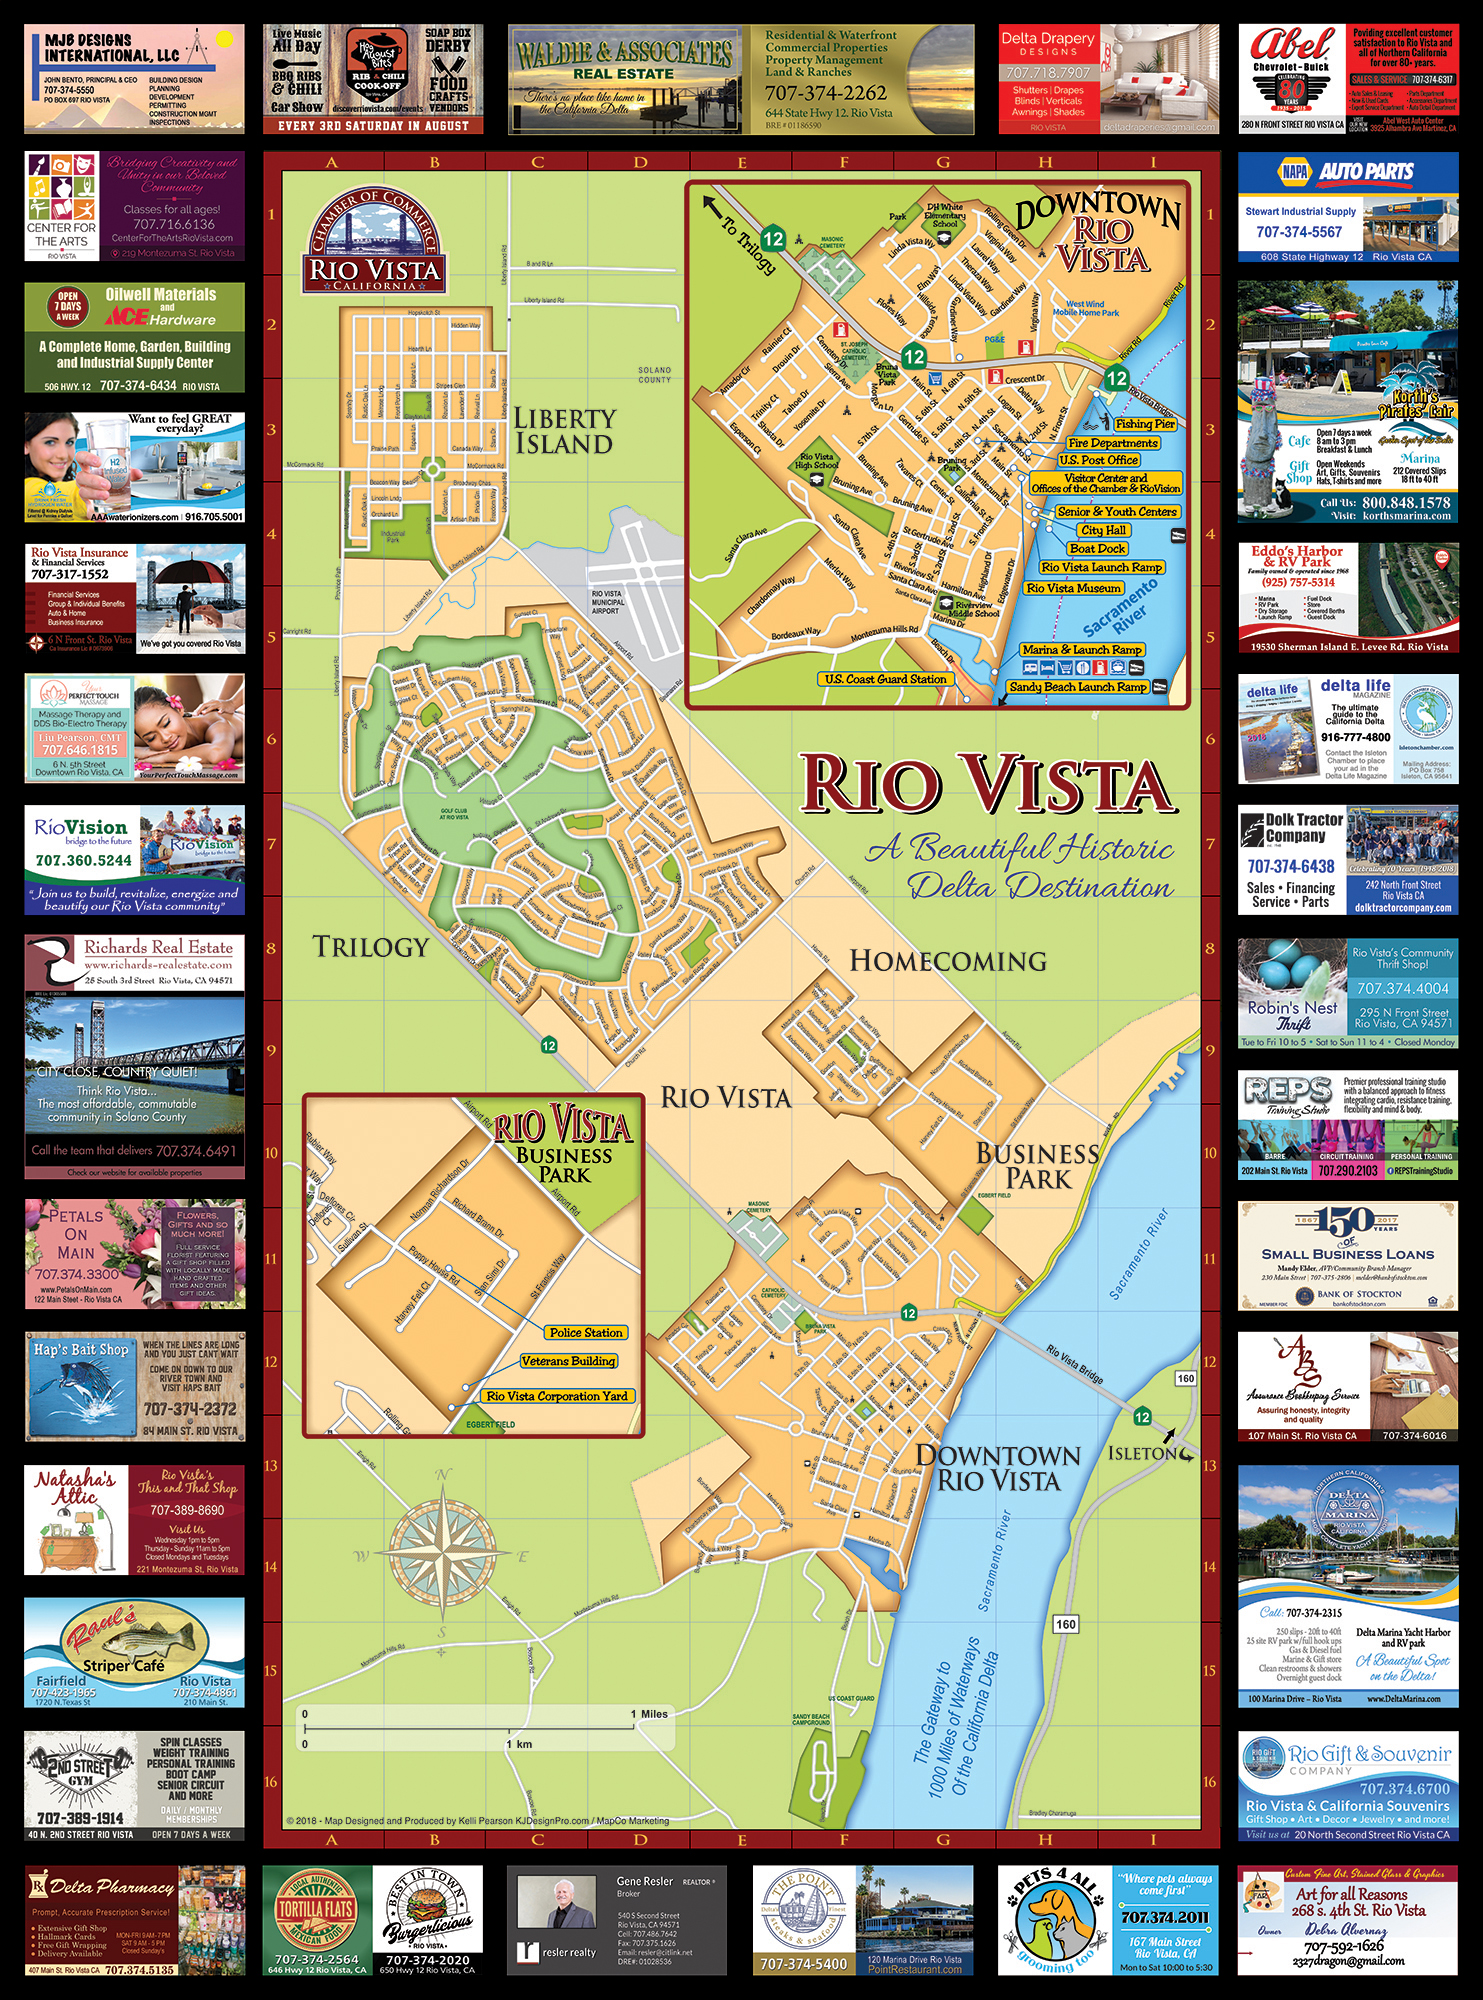 Rio-Vista-City-Map-side-1.jpg